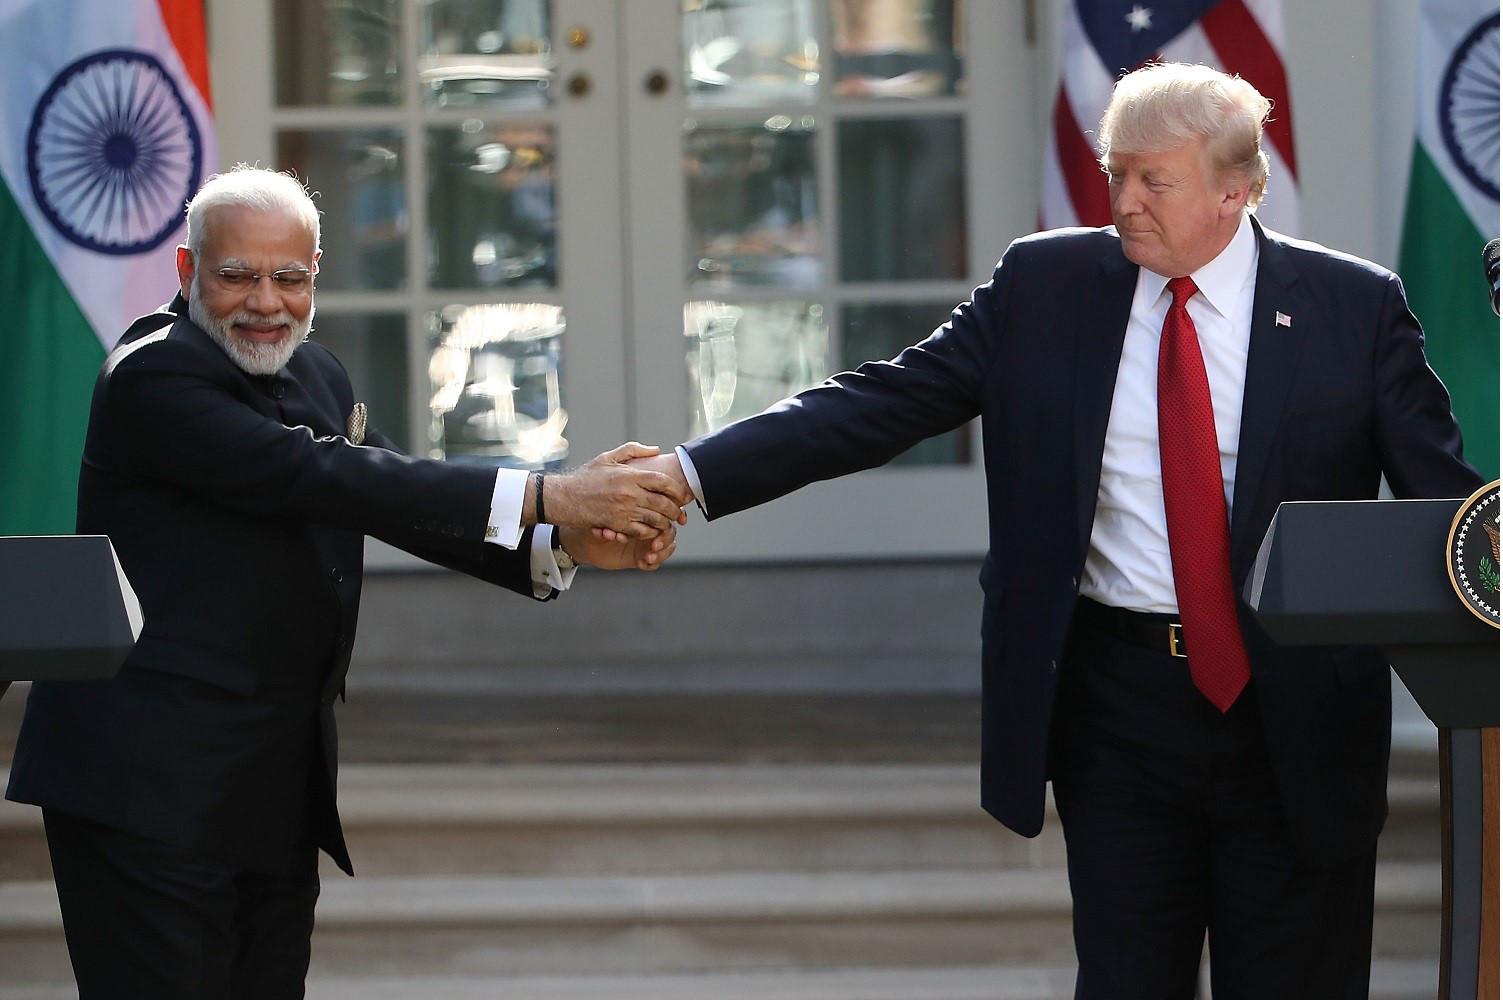 Trump india visit, Republic day, Donald Trump, World News